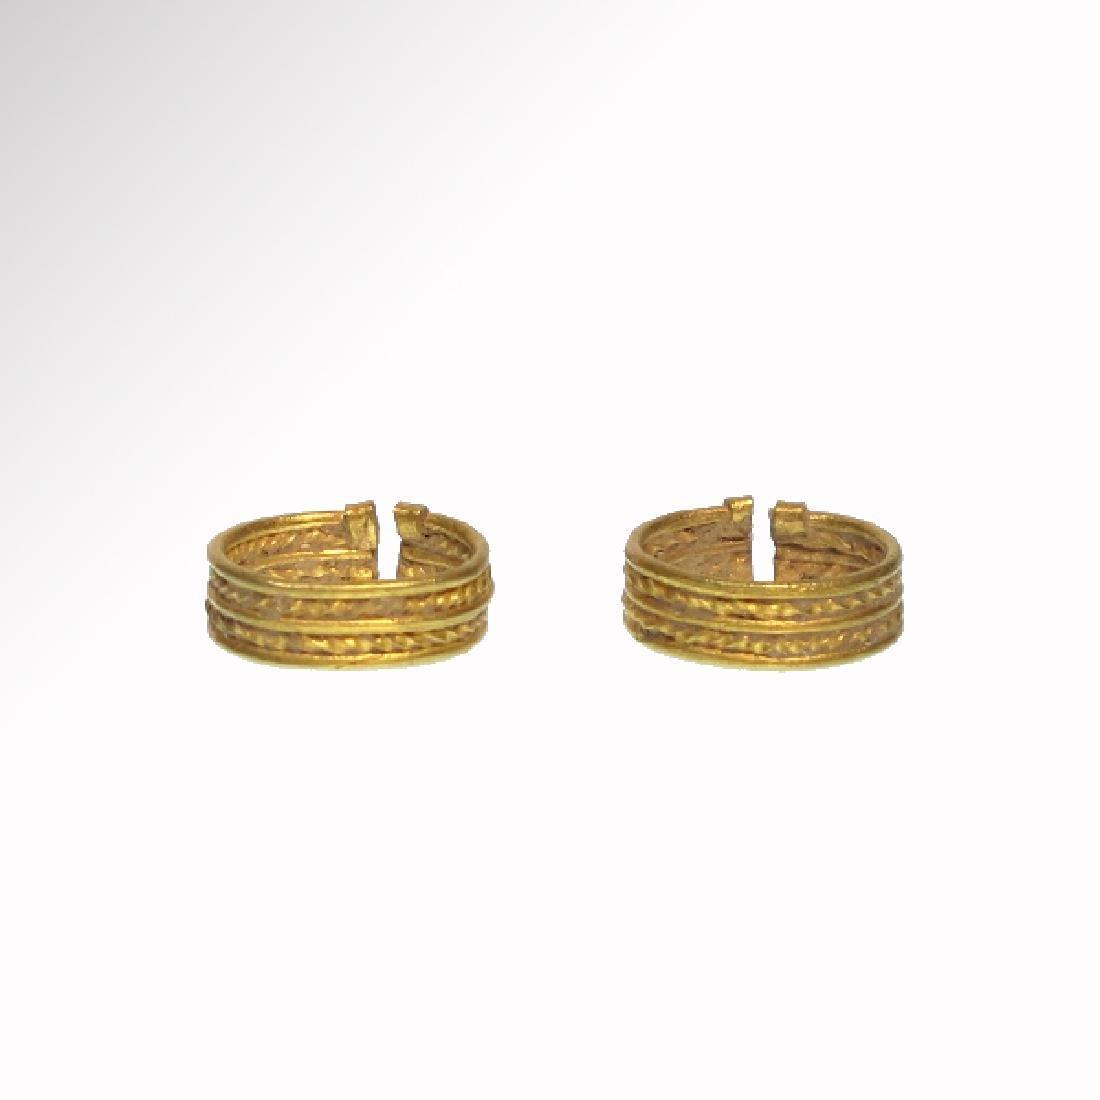 Pair of Greek Gold Hair Rings, C. 300 BC